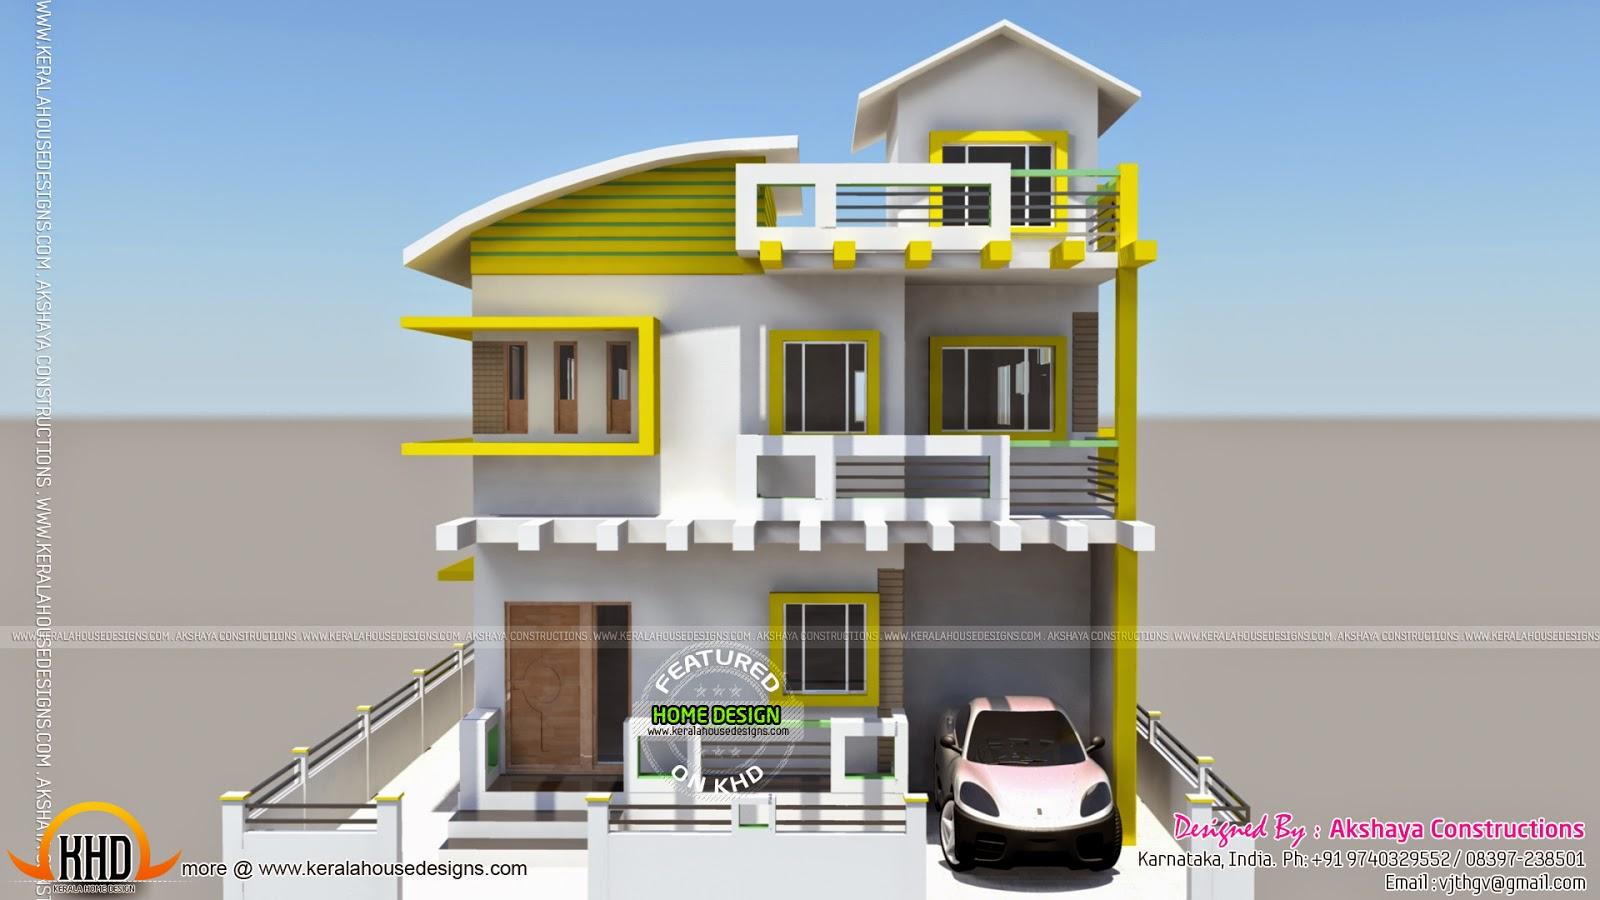 karnataka home design kerala home design floor plans home floor plans home interior design